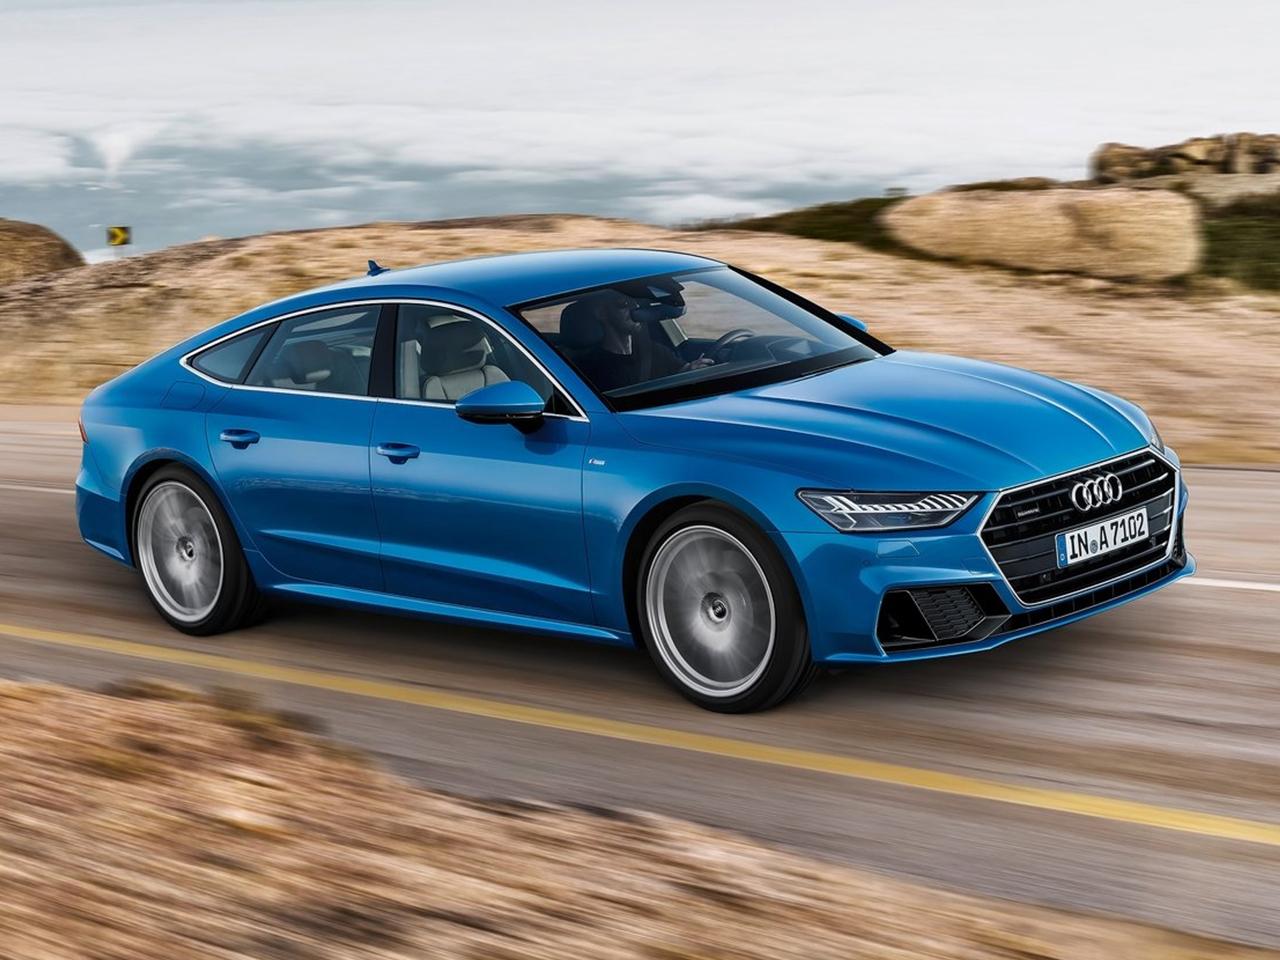 Audi A7 Sportback exterior